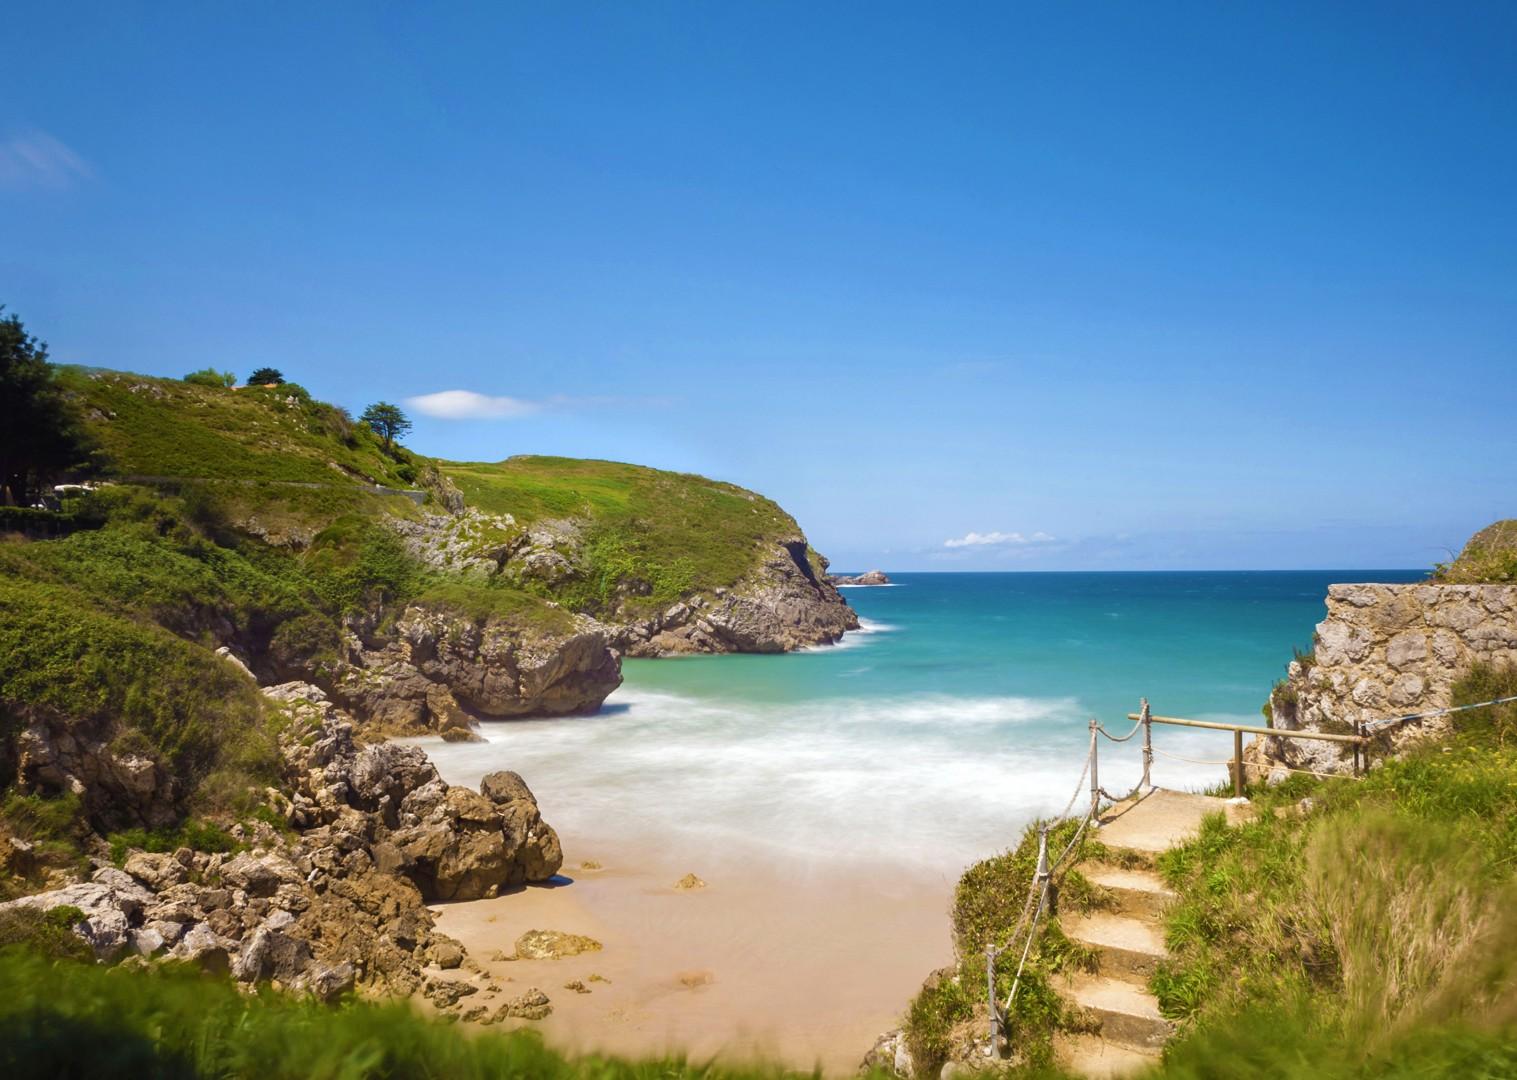 _Holiday.616.13997.jpg - Spain - Asturian Coastal Ride - Guided Family Cycling Holiday - Family Cycling